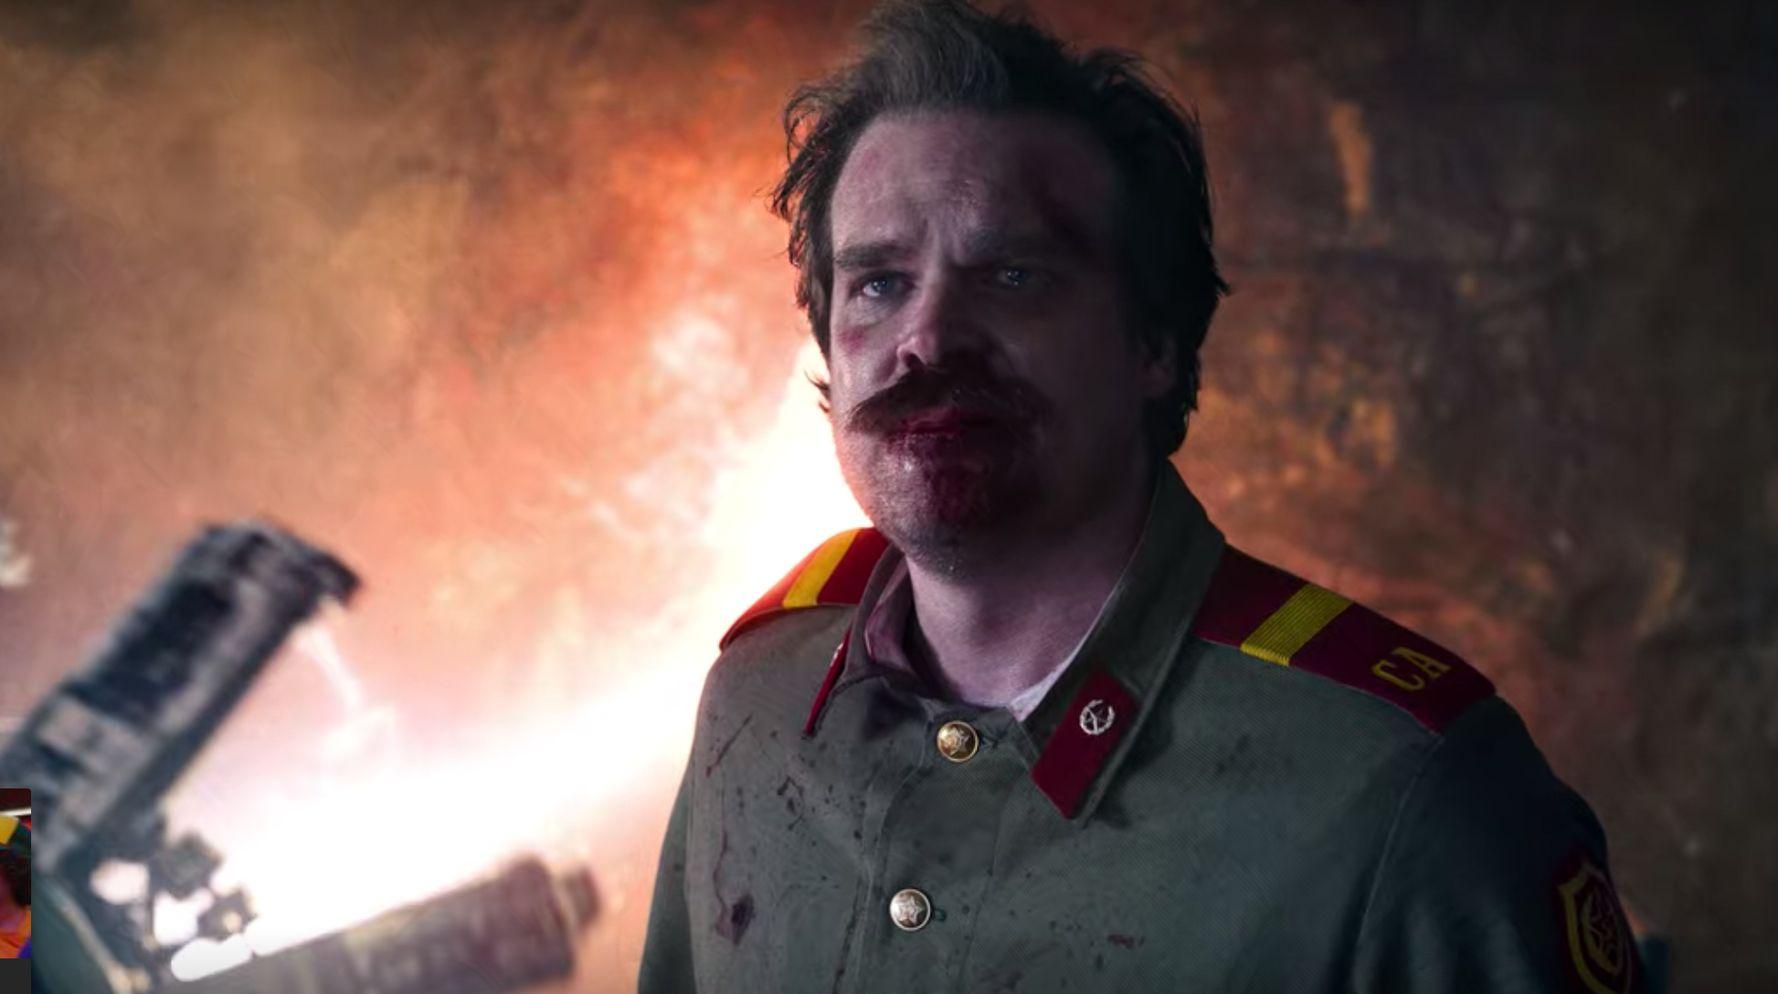 Westlake Legal Group 5e46bde91e00002e009896a5 'Stranger Things' Teaser Confirms 'Dead' Character Is Coming Back